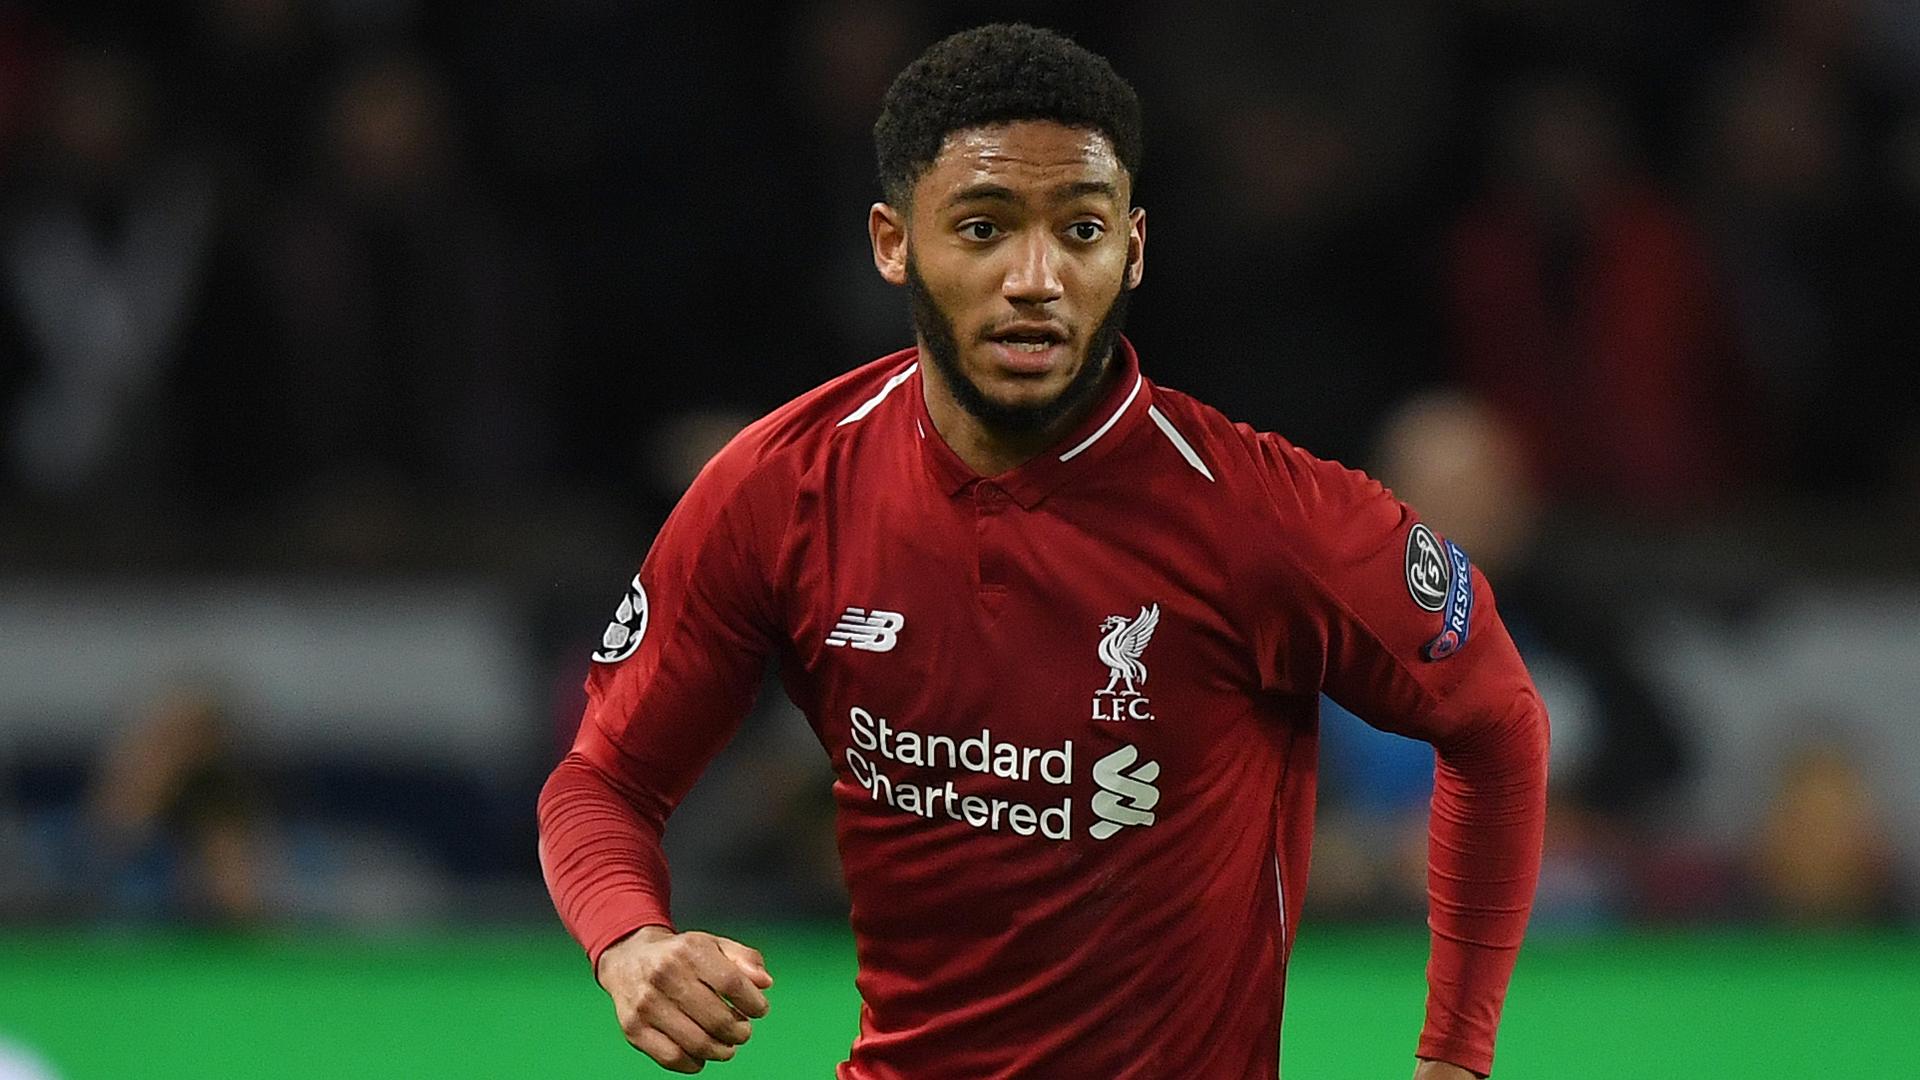 Gomez: Liverpool 'motivated' to win the Premier League after last season's heartbreak